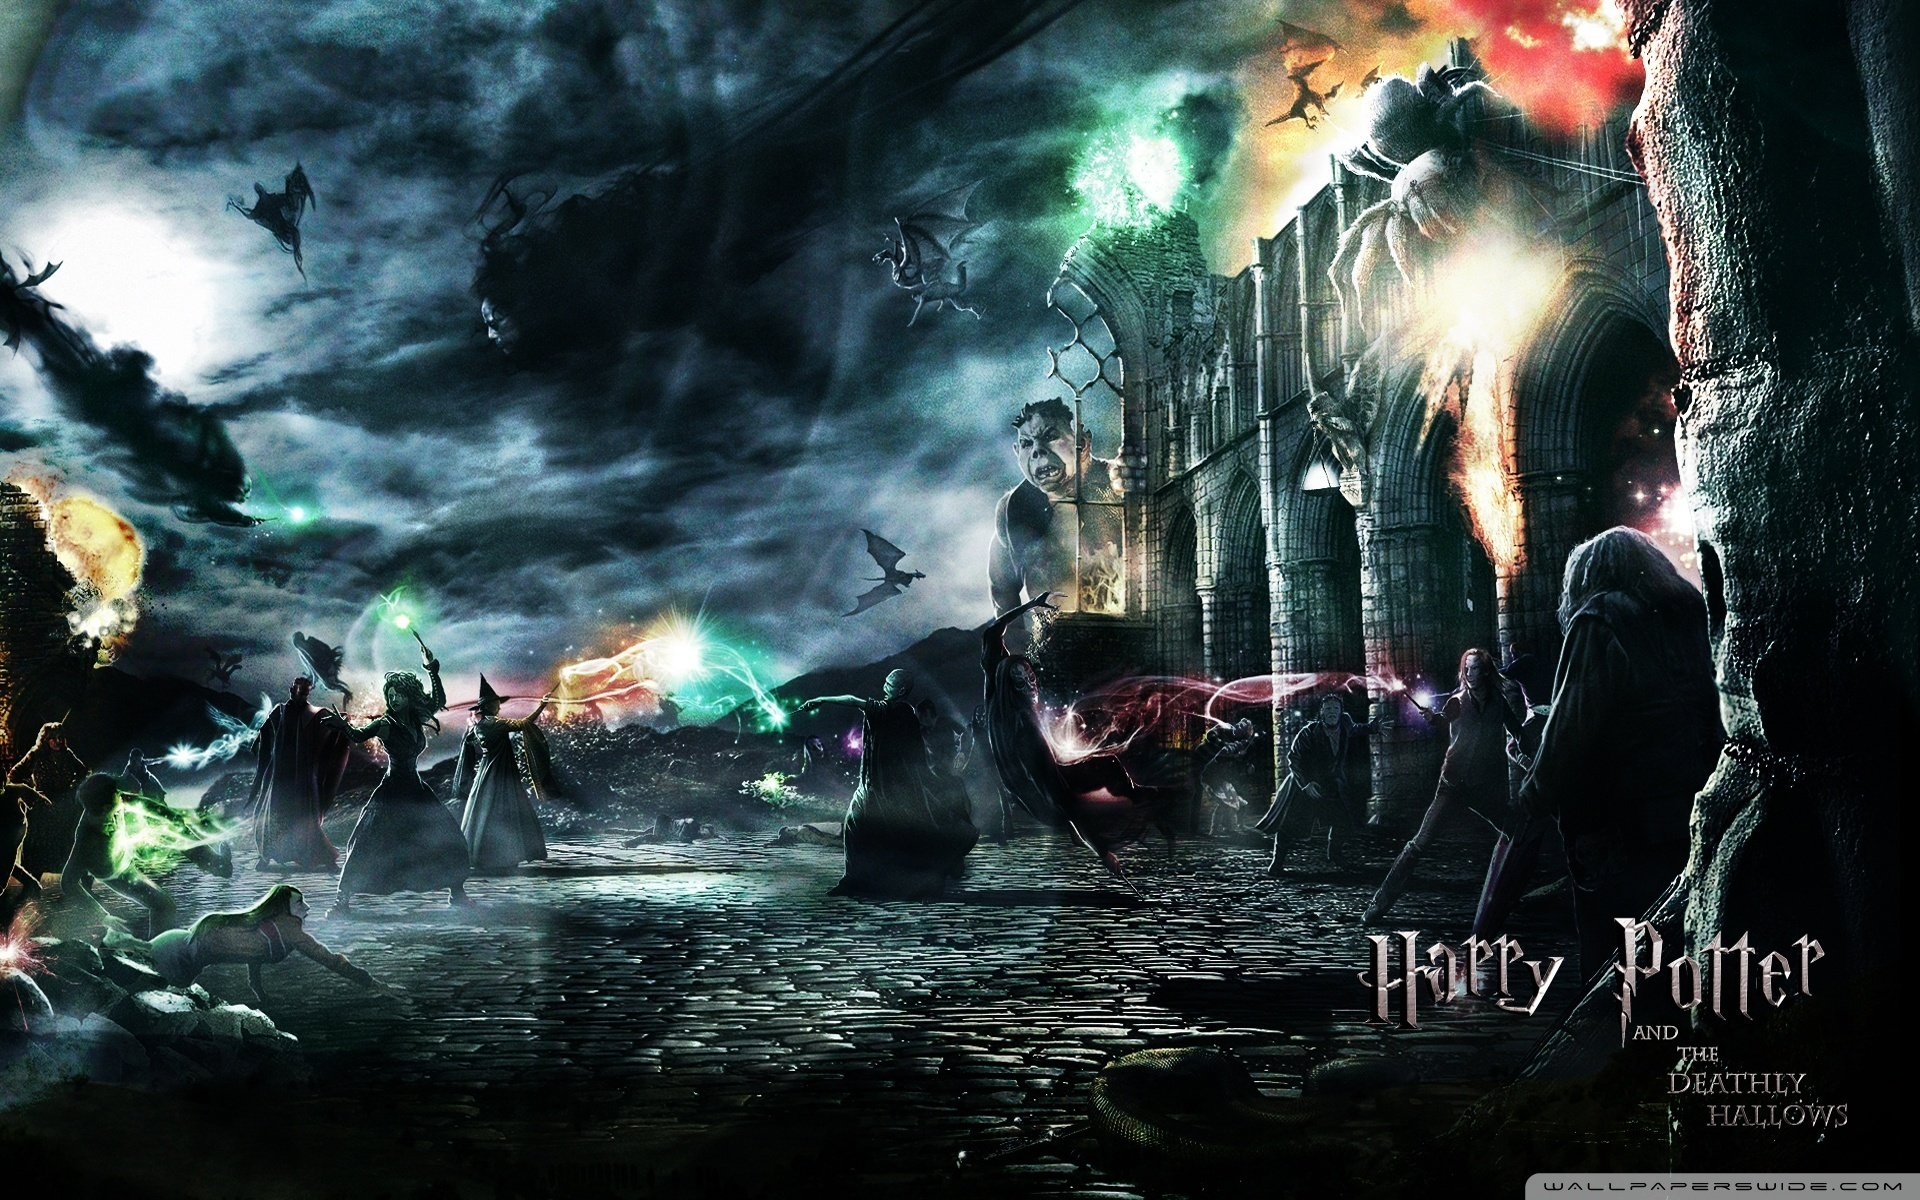 Wonderful Wallpaper Harry Potter Deathly Hallows - Hogwart-s-Battle-the-deathly-hallows-16562188-1920-1200  HD_295434.jpg